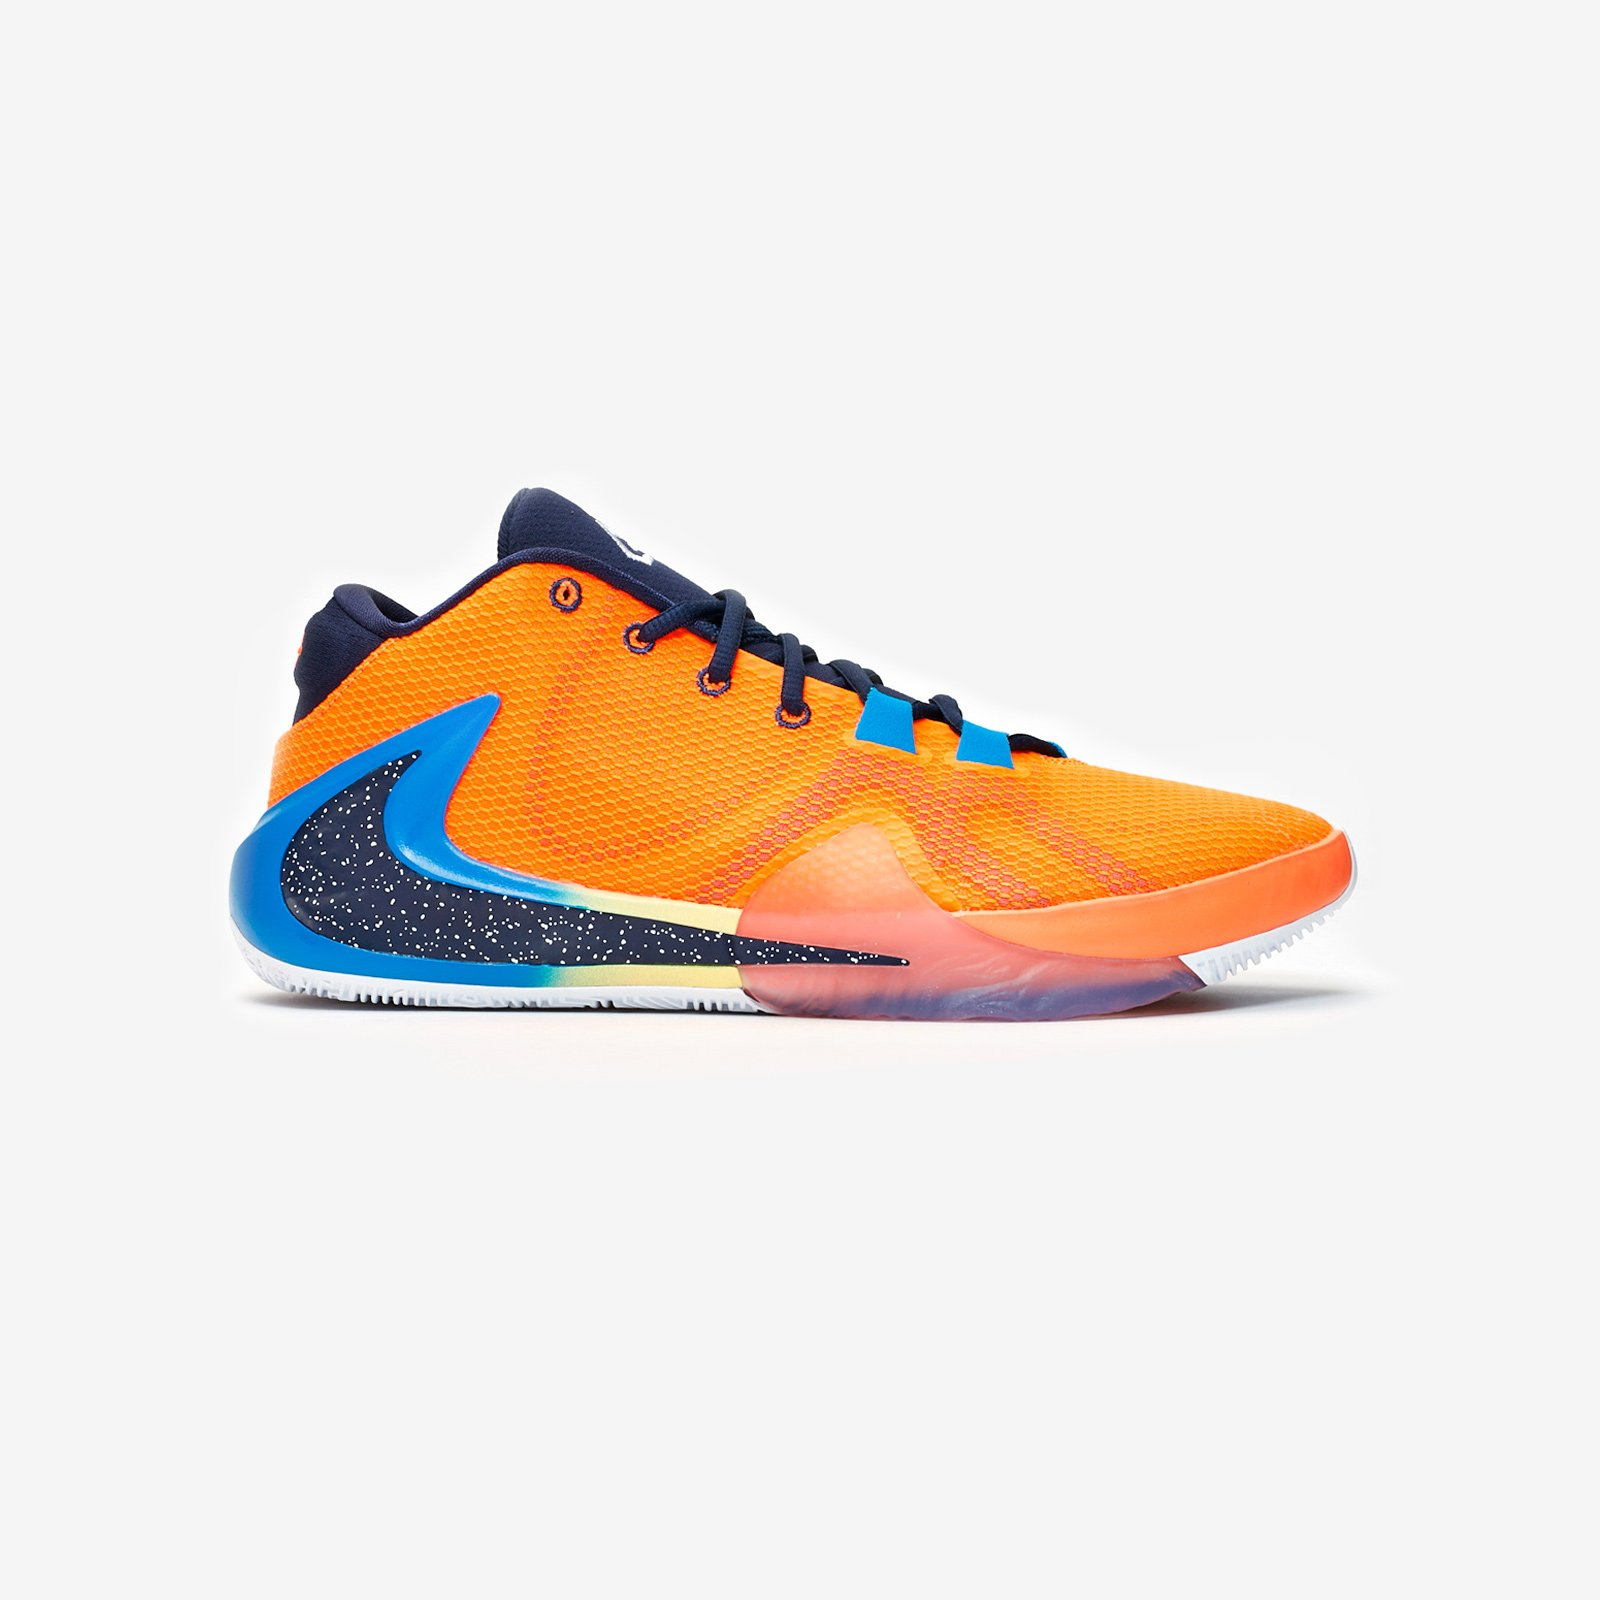 Freak Nike 1 Bq5422 800 Zoom SneakersnstuffSneakers 5R3j4AL